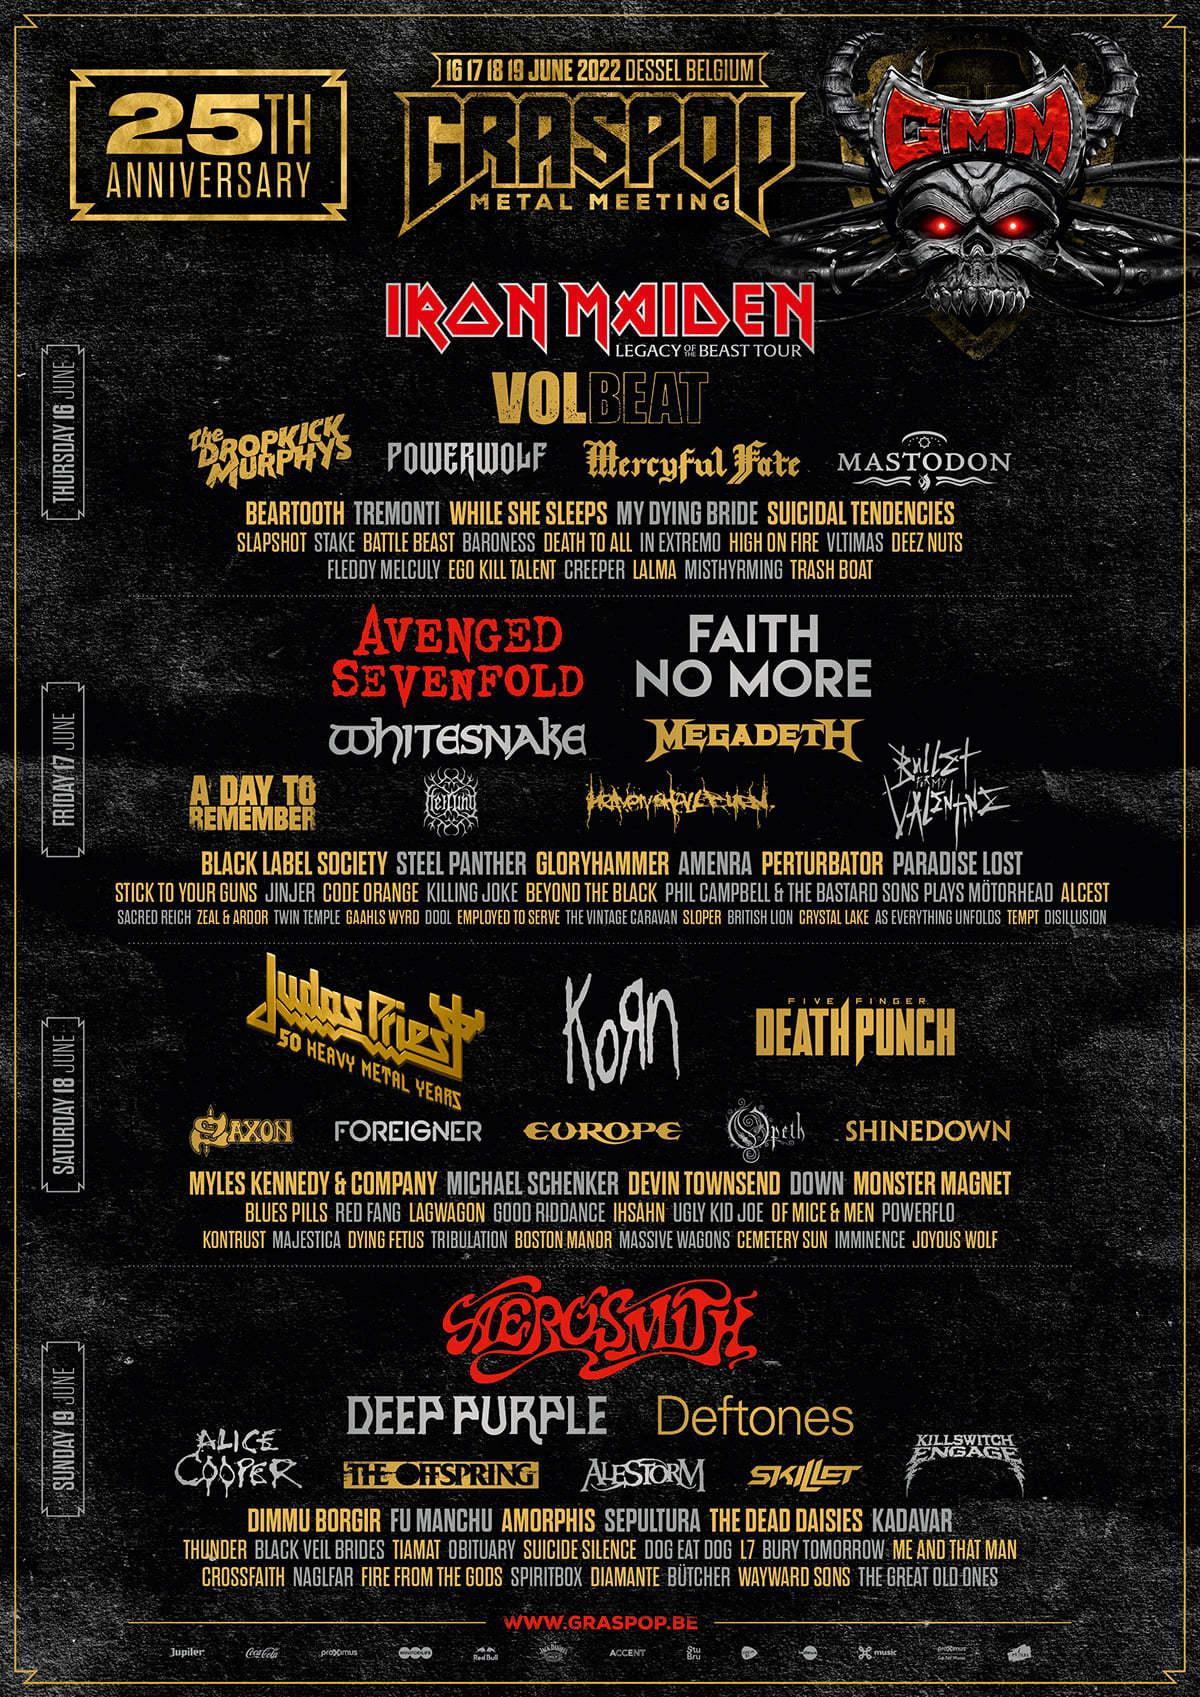 Graspop Metal Meeting 2019 - Página 4 Graspop-Metal-Meeting-2022-poster